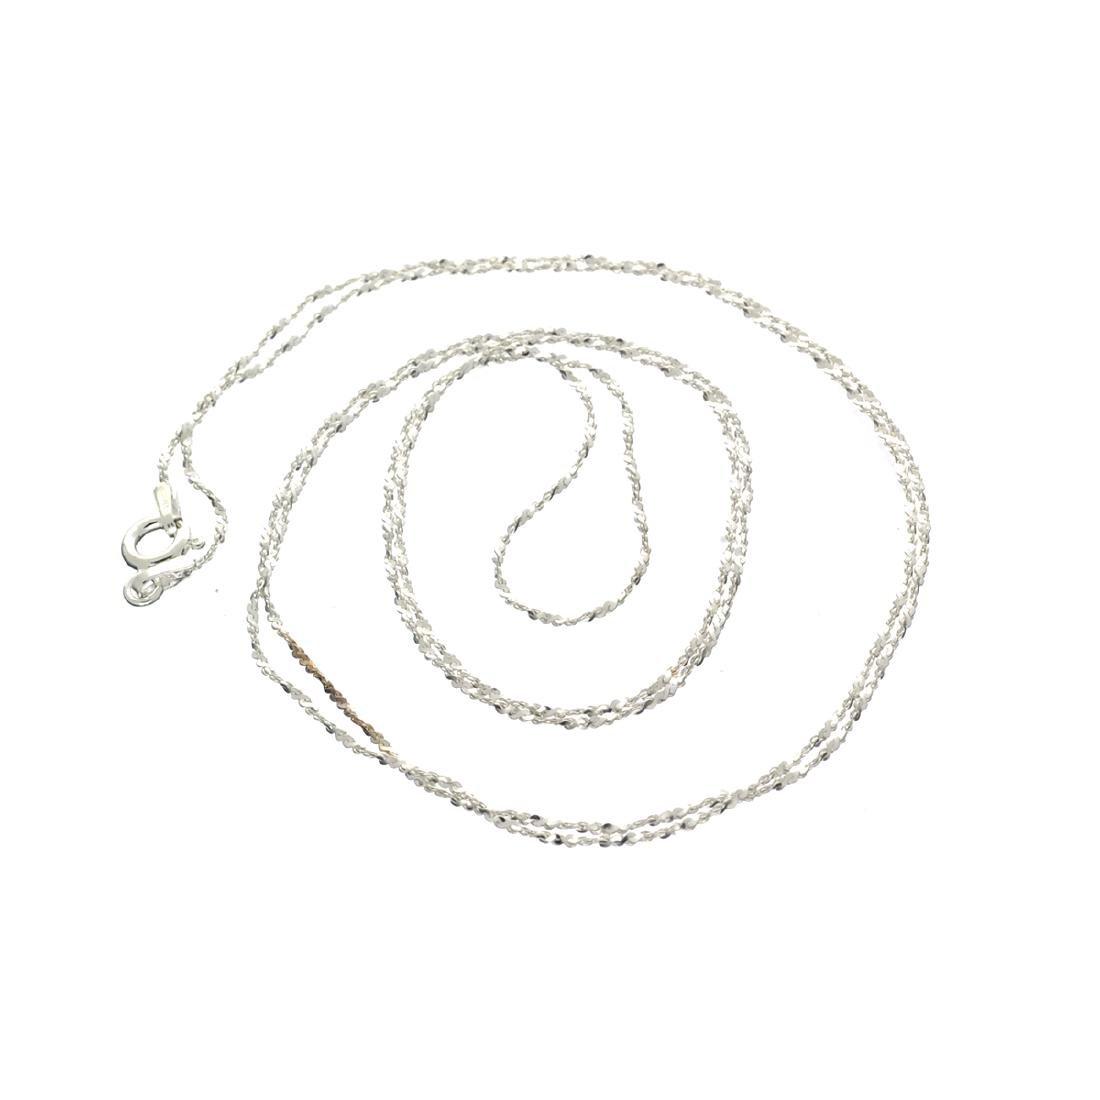 Fine Jewelry Designer Sebastian, 30'' Italian Sterling